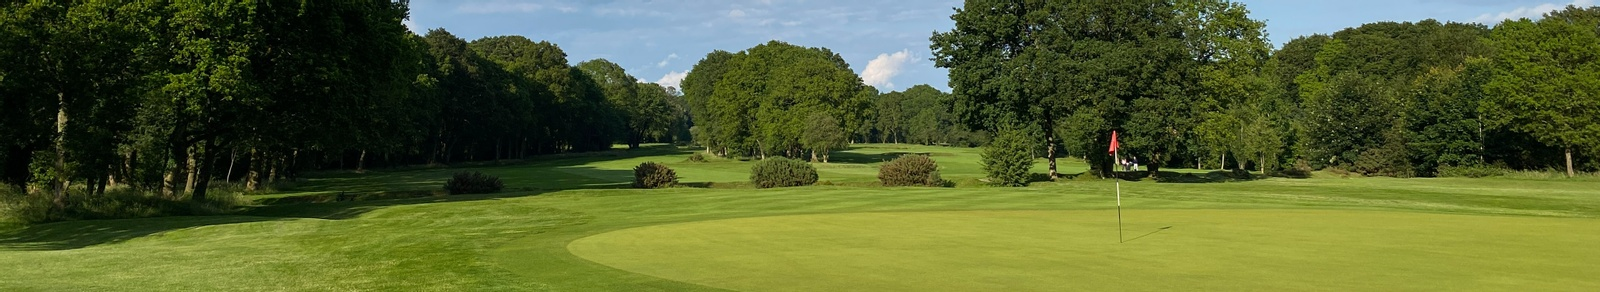 The Company Golf Day at Huntercombe banner